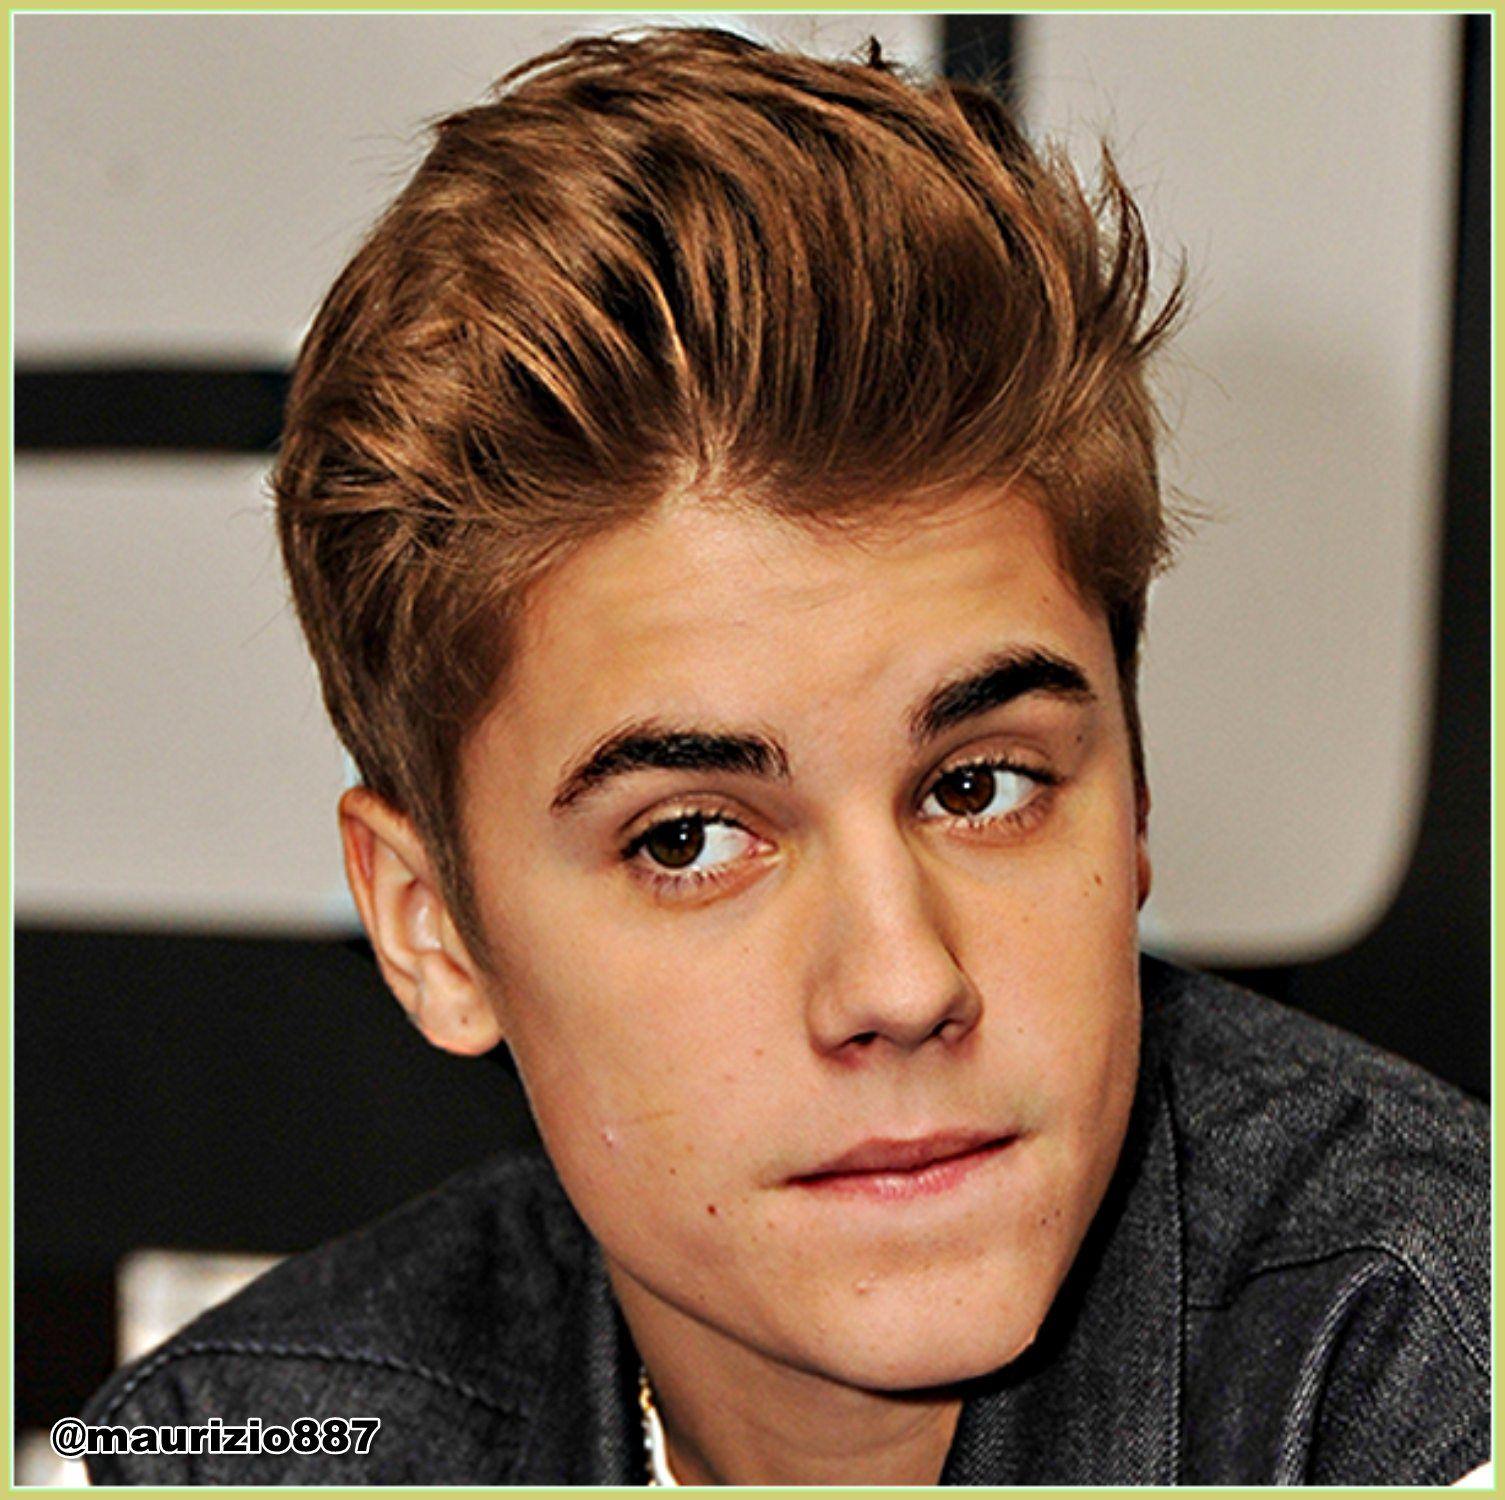 Wallpaper download justin bieber - Justin Bieber Justin Bieber 2013 Justin Bieber Photo 33371501 Fanpop Fanclubs